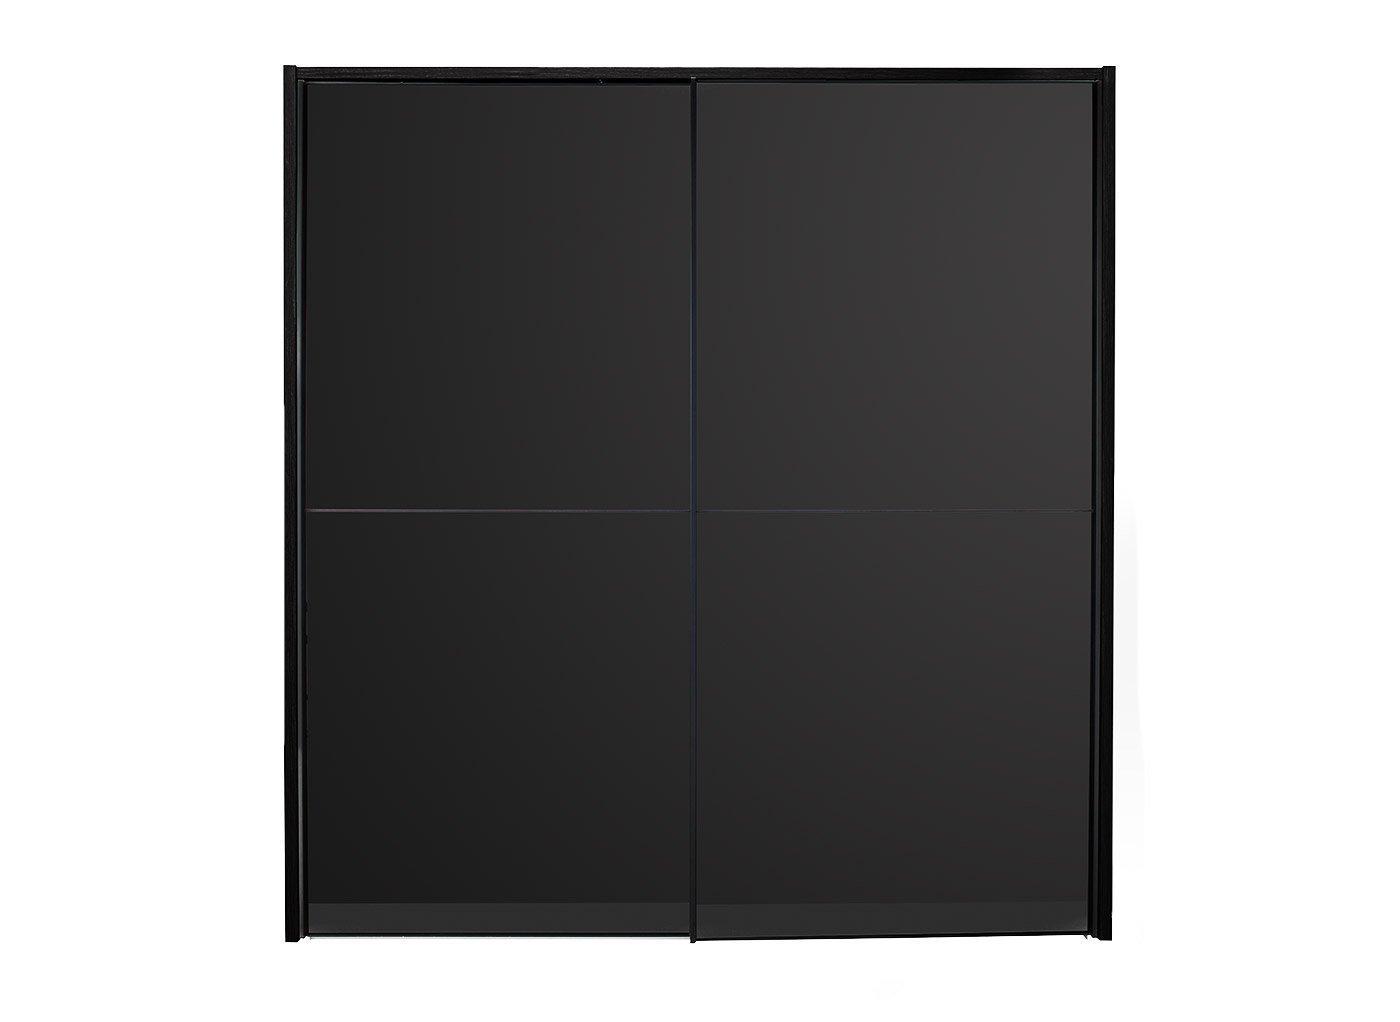 Trinidad 2 Door Large Sliding Wardrobe - Black